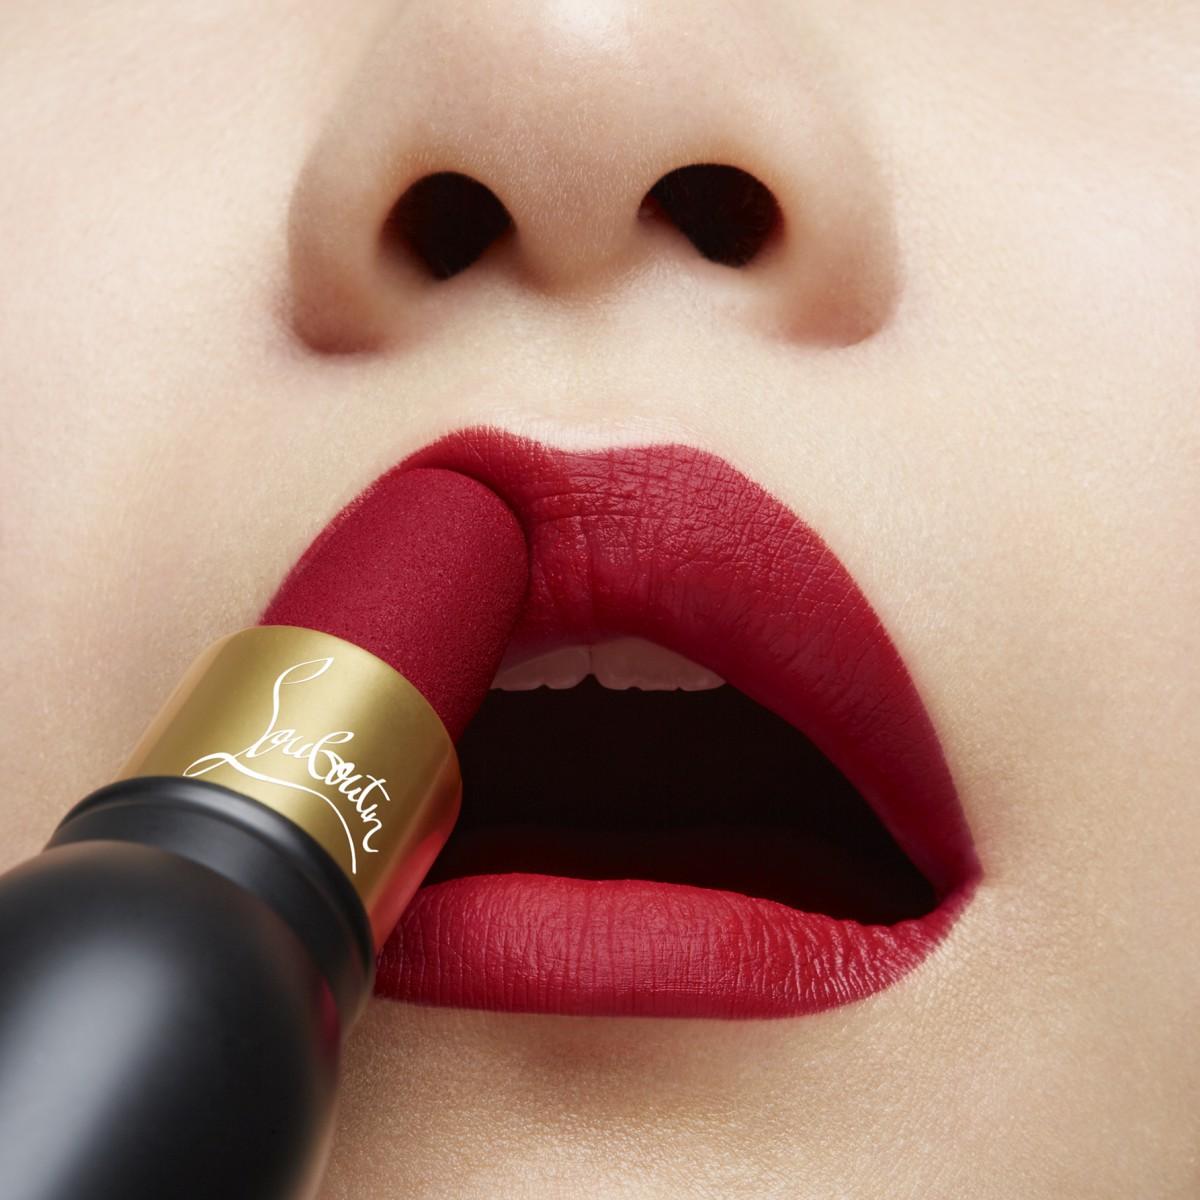 Woman Beauty - リップカラー ルージュ ルブタン 001m - Christian Louboutin